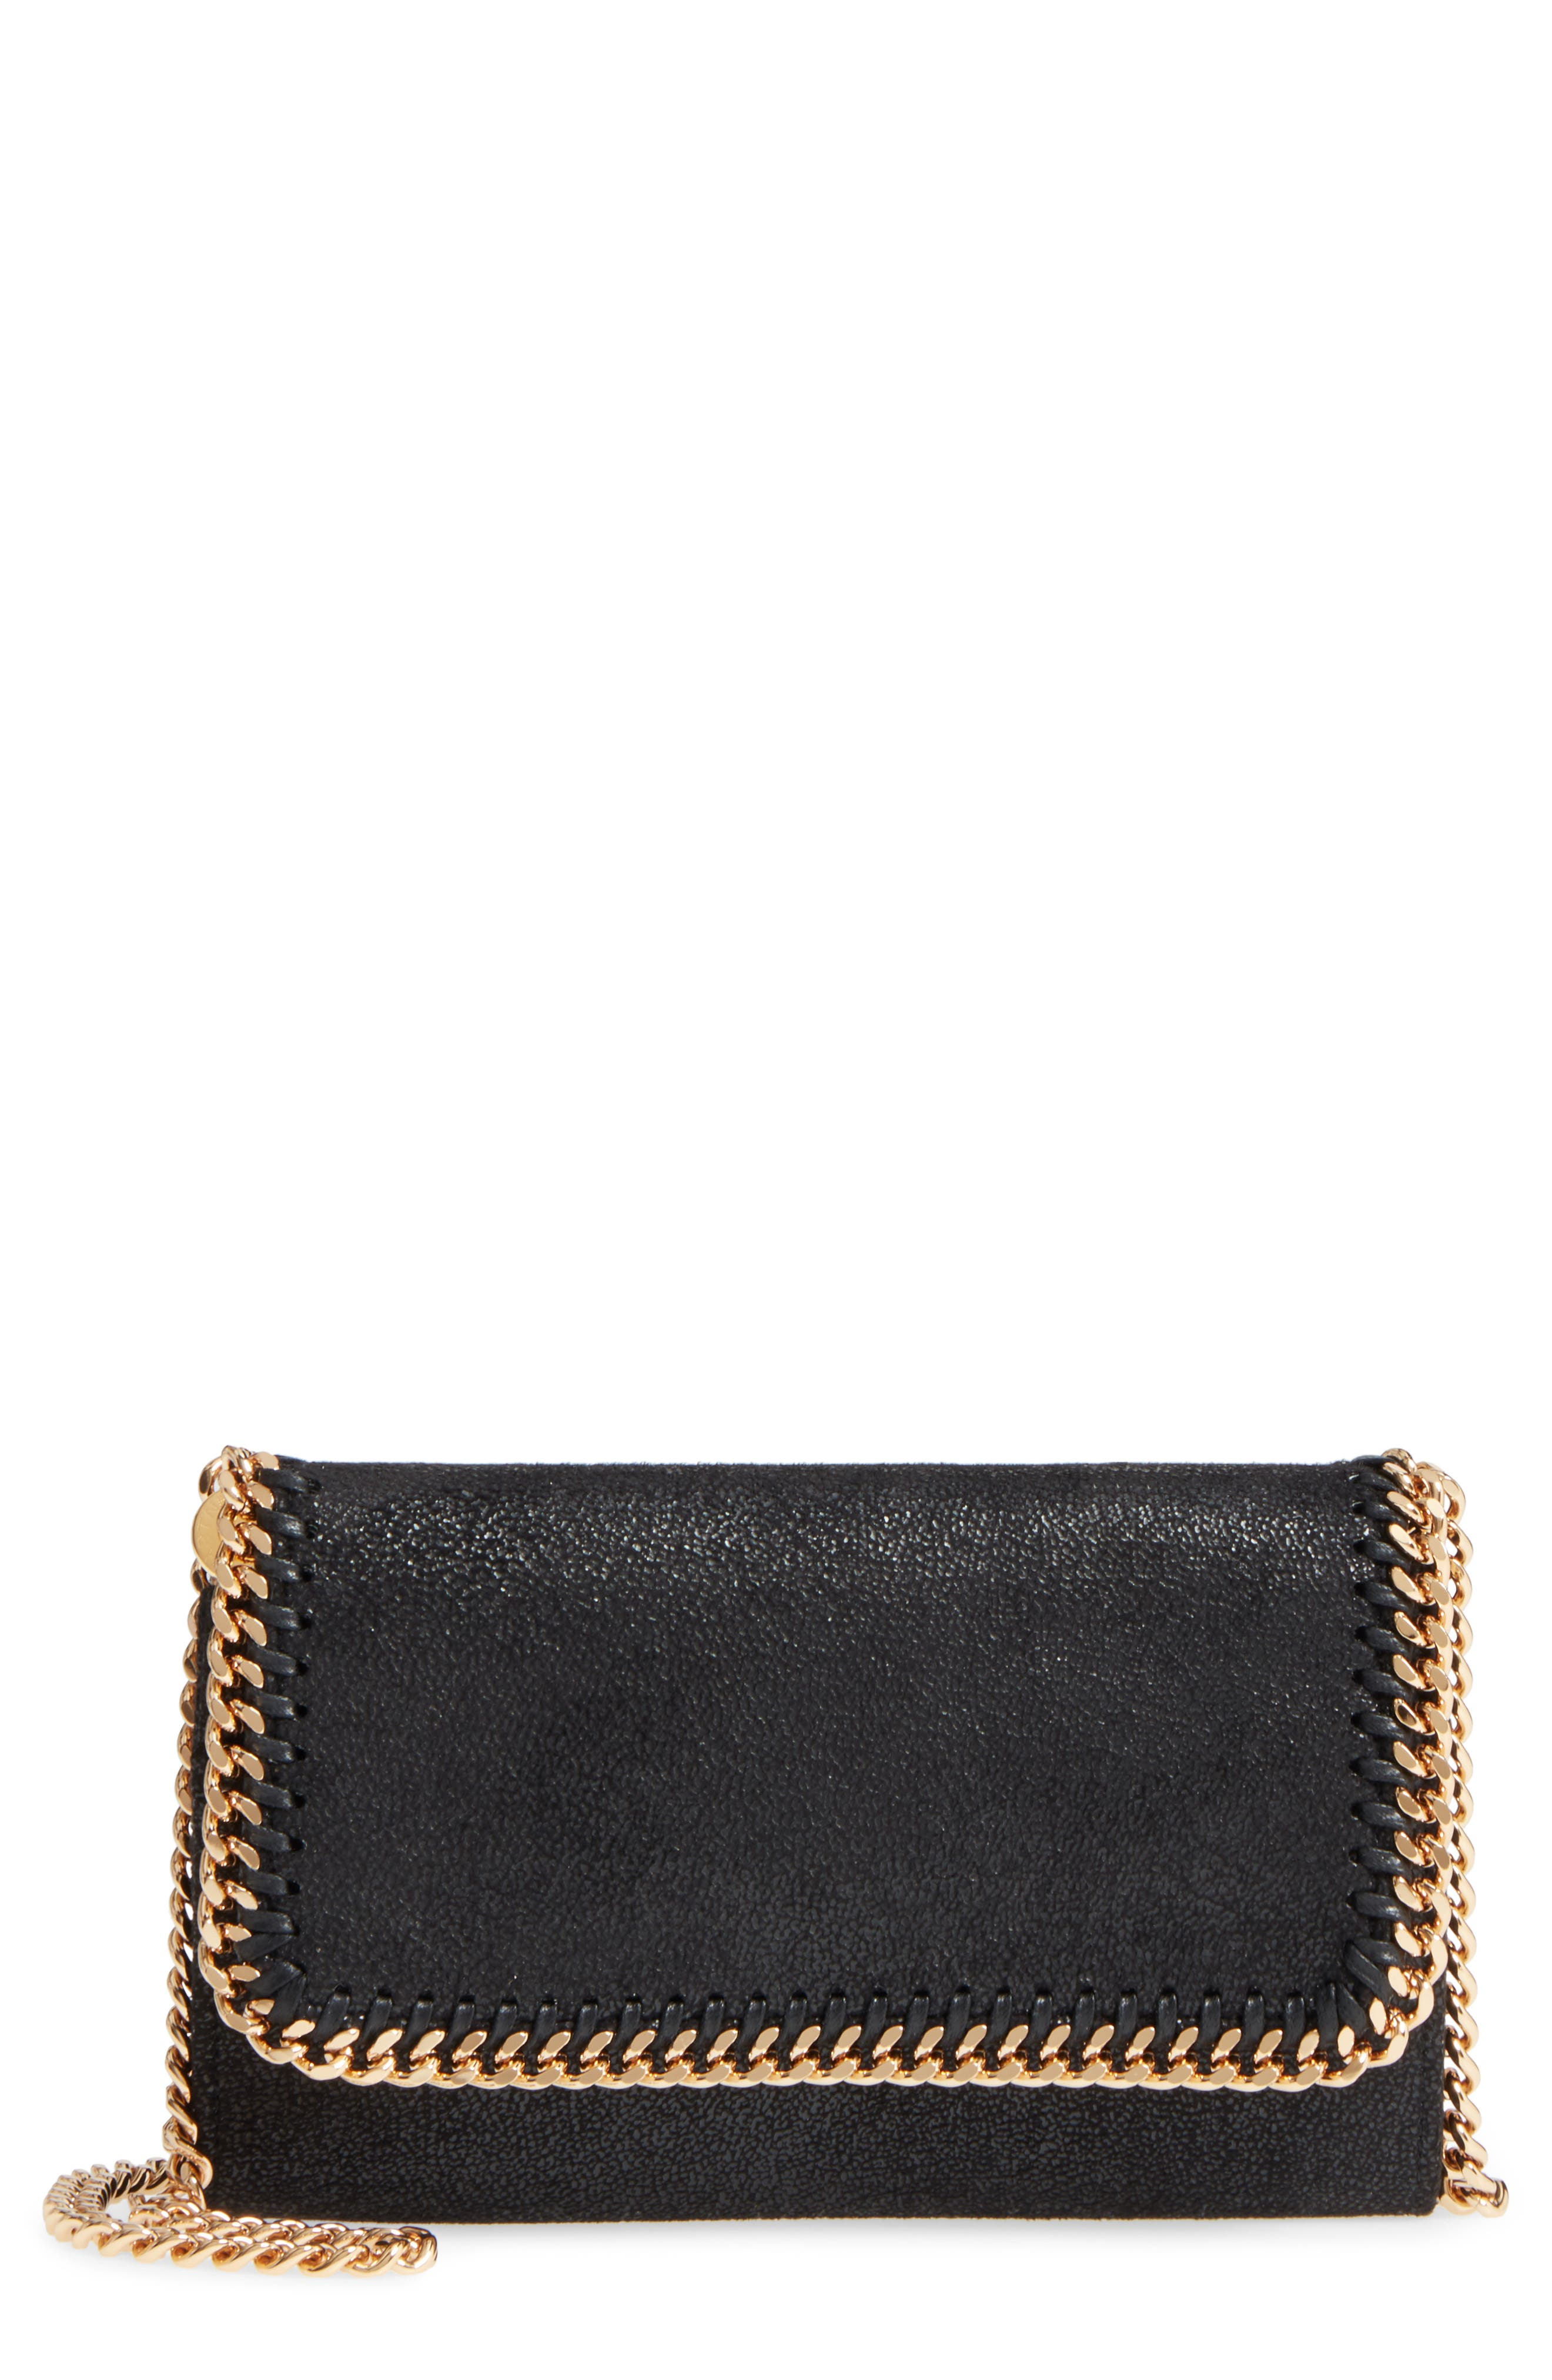 Shaggy Deer Faux Leather Crossbody Bag,                             Main thumbnail 1, color,                             BLACK